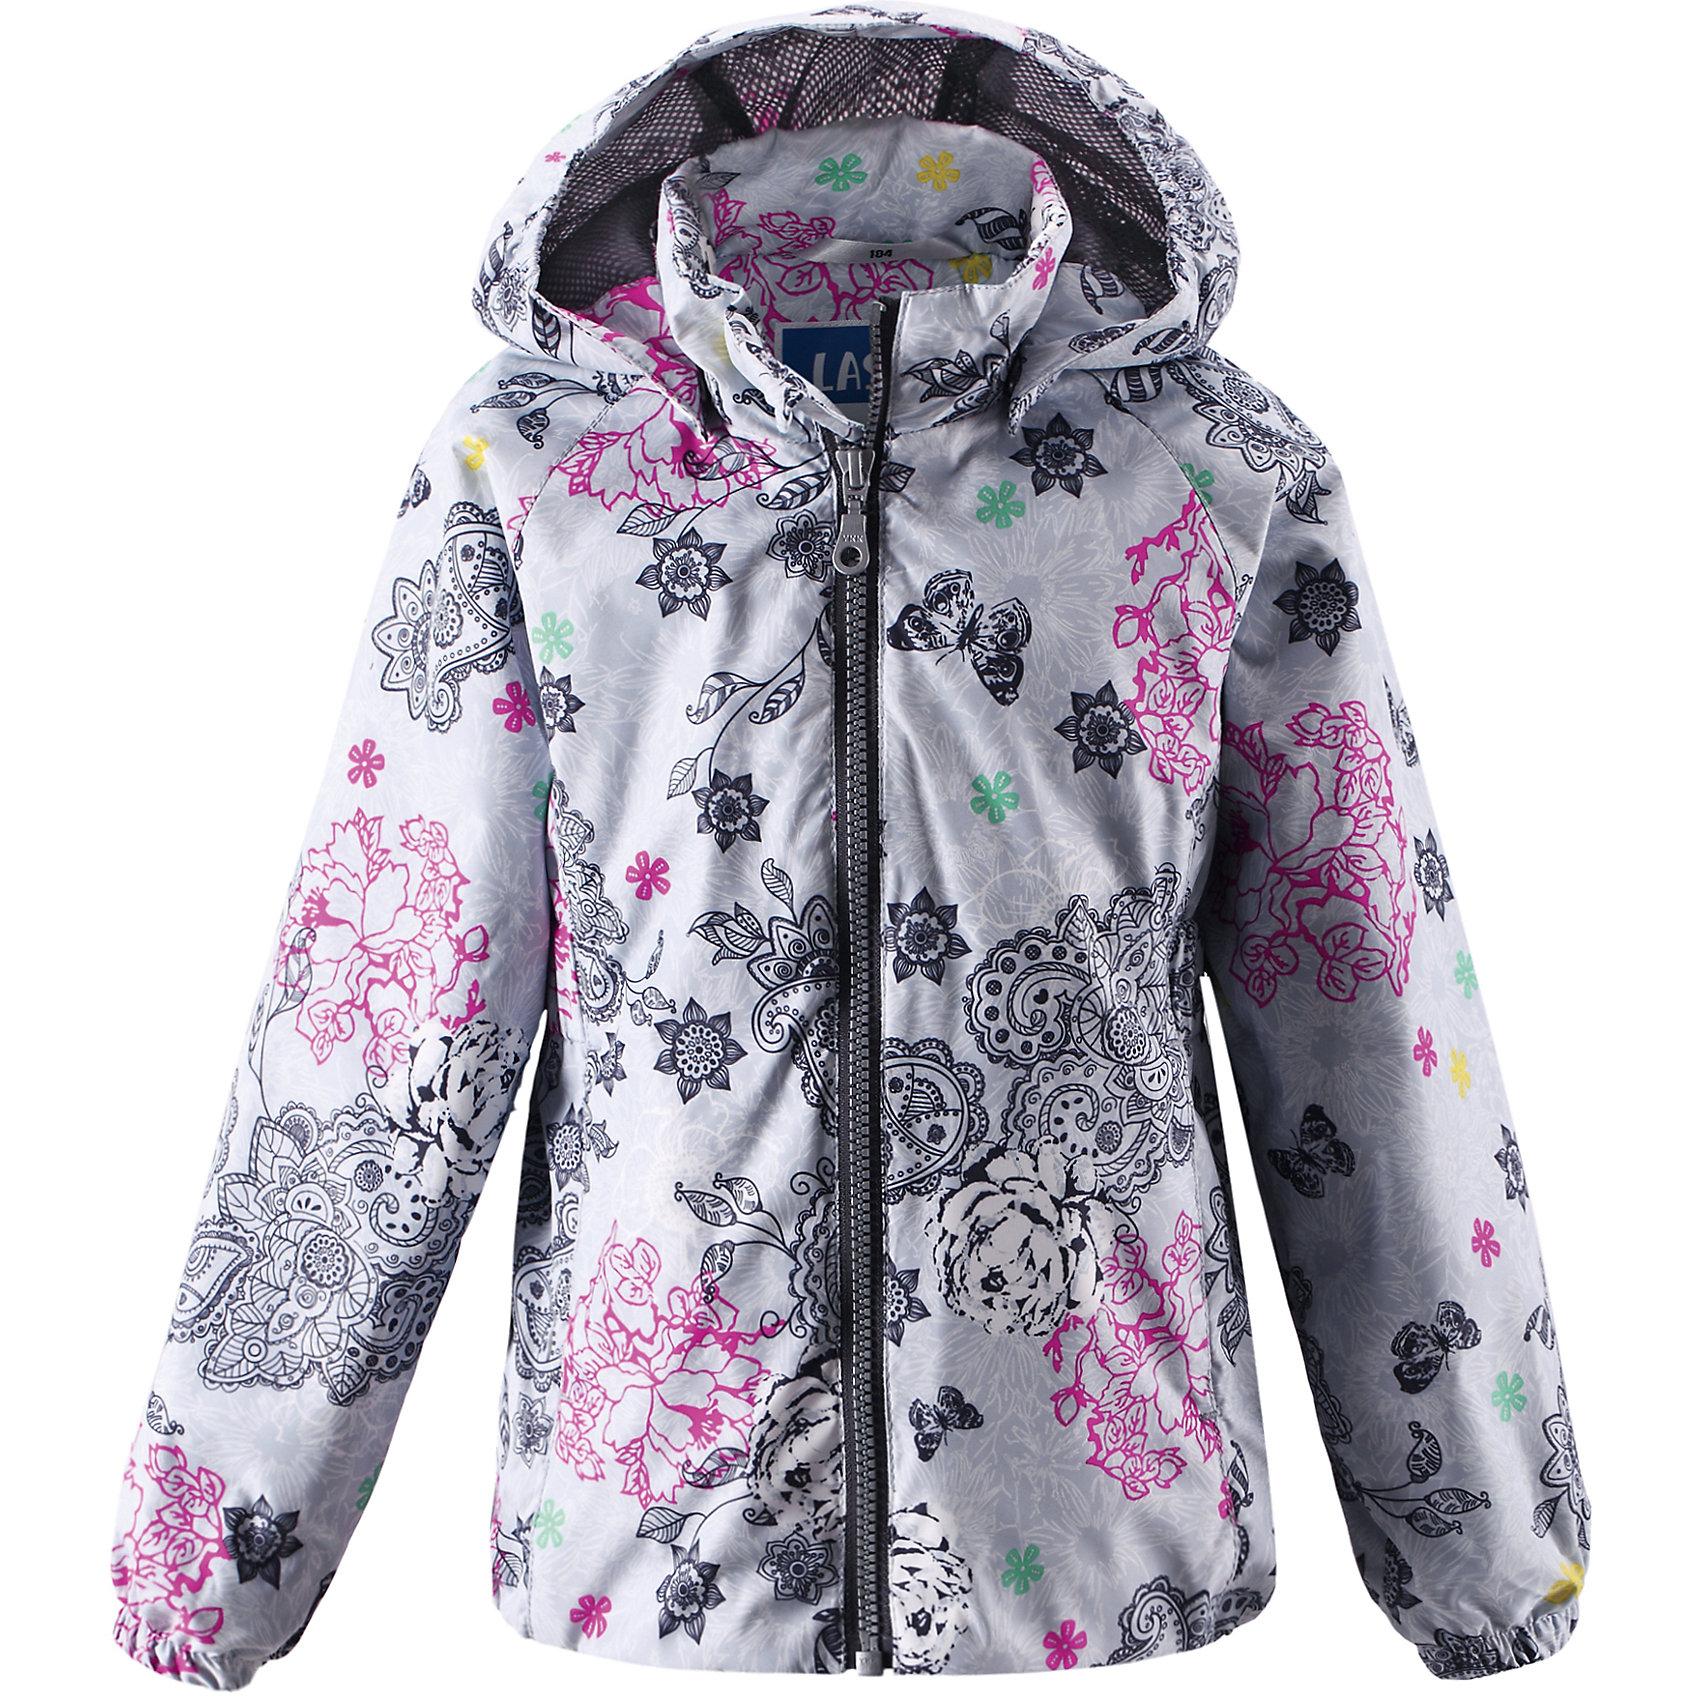 Куртка LASSIE by ReimaКуртка от финской марки LASSIE by Reima.<br>*куртка для девочек<br>*съемный капюшон<br>*карманы на липучках<br>*эластичные вставки по бокам подола<br>Состав:<br>100% ПЭ, ПУ-покрытие<br><br>Ширина мм: 356<br>Глубина мм: 10<br>Высота мм: 245<br>Вес г: 519<br>Цвет: серый<br>Возраст от месяцев: 24<br>Возраст до месяцев: 36<br>Пол: Женский<br>Возраст: Детский<br>Размер: 104,98,92,128,116,140,134,122,110<br>SKU: 4631697